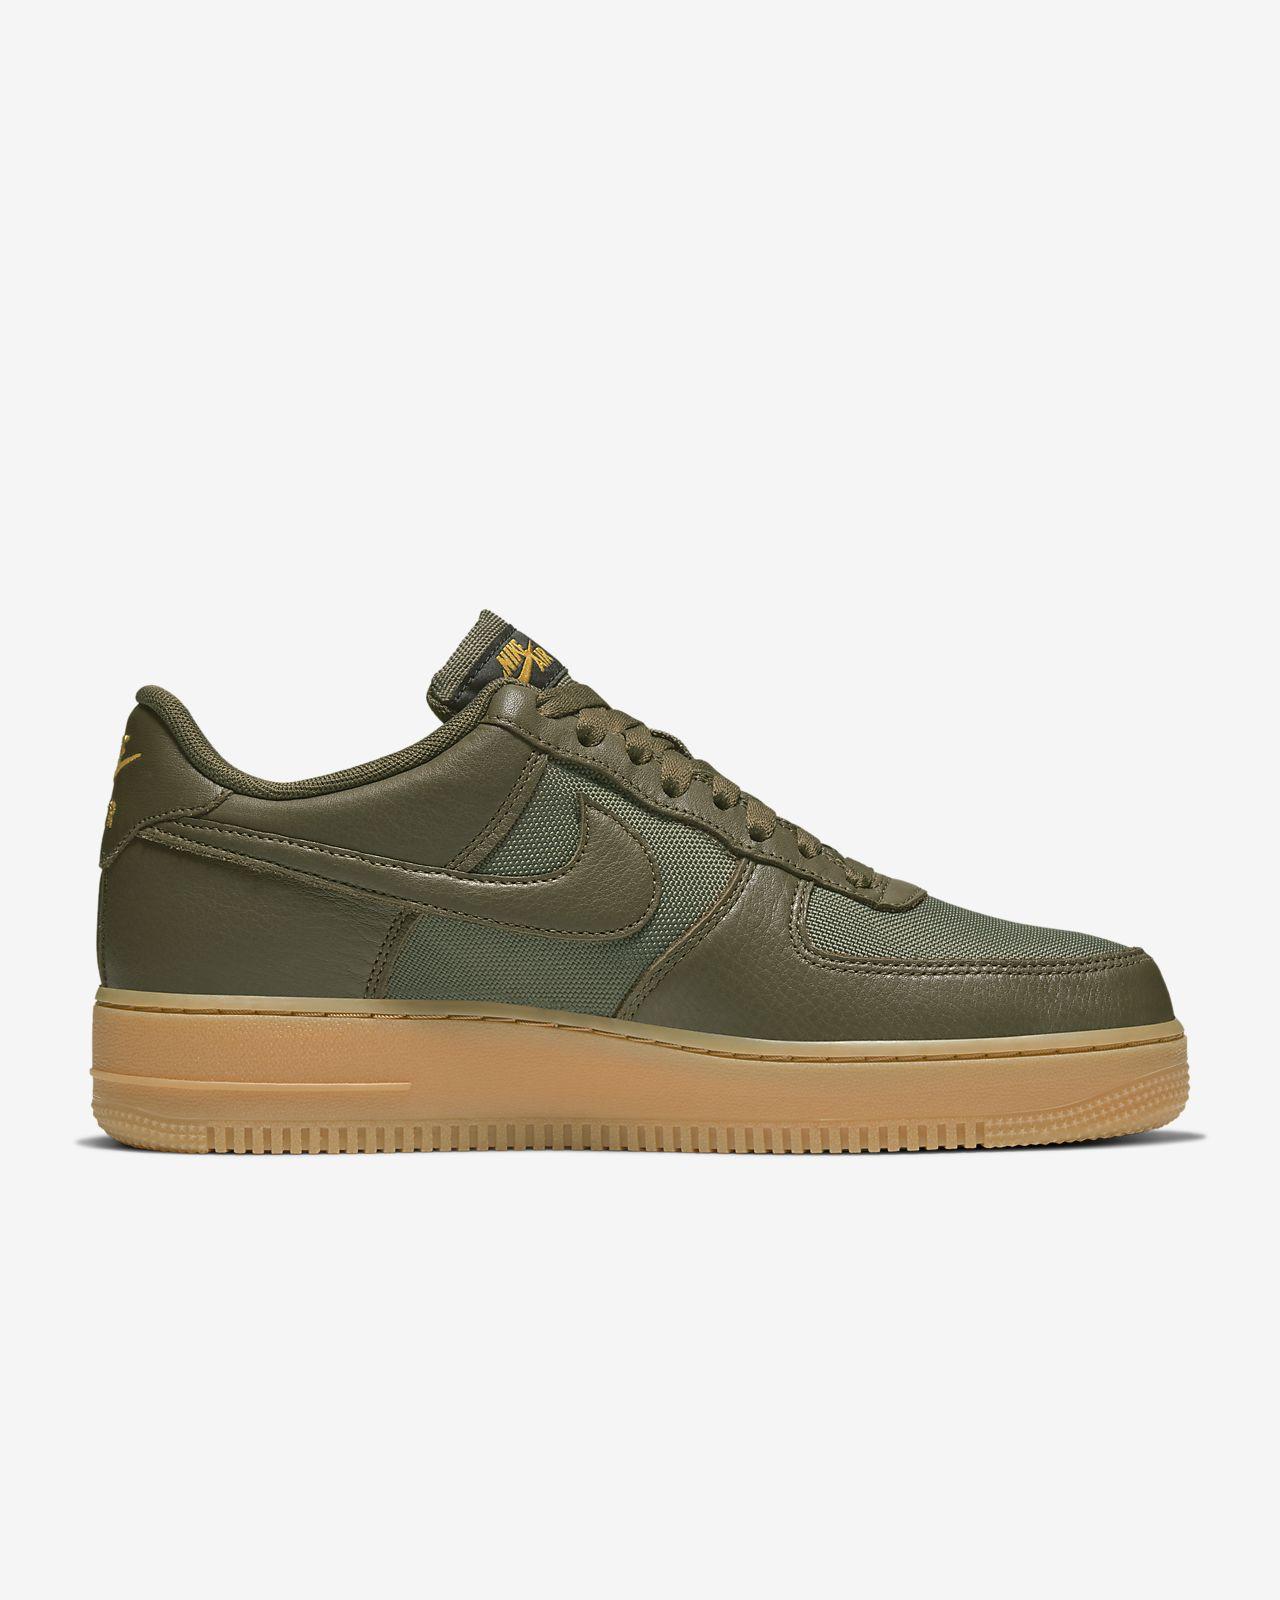 Nike Air Force 1 GORE TEX CK2630 200 zielony